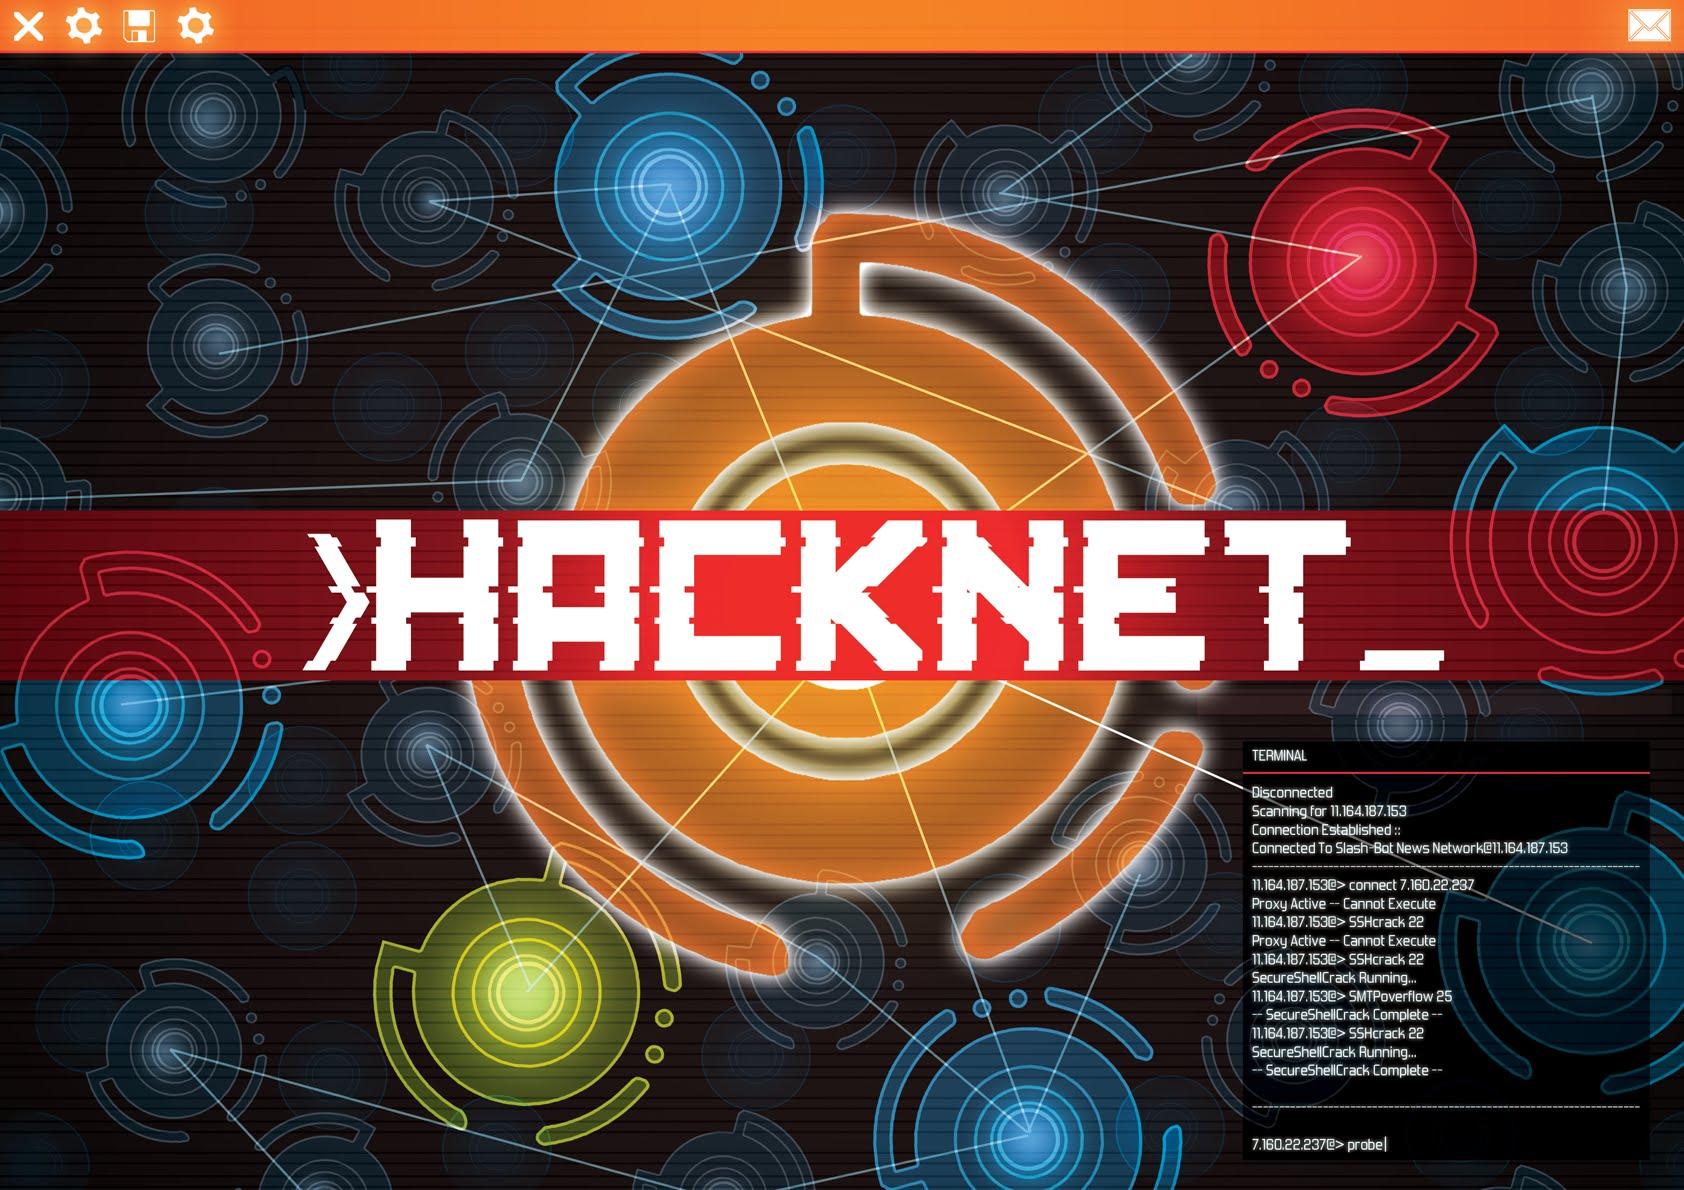 Hacknet is free over on Humble Bundle screenshot